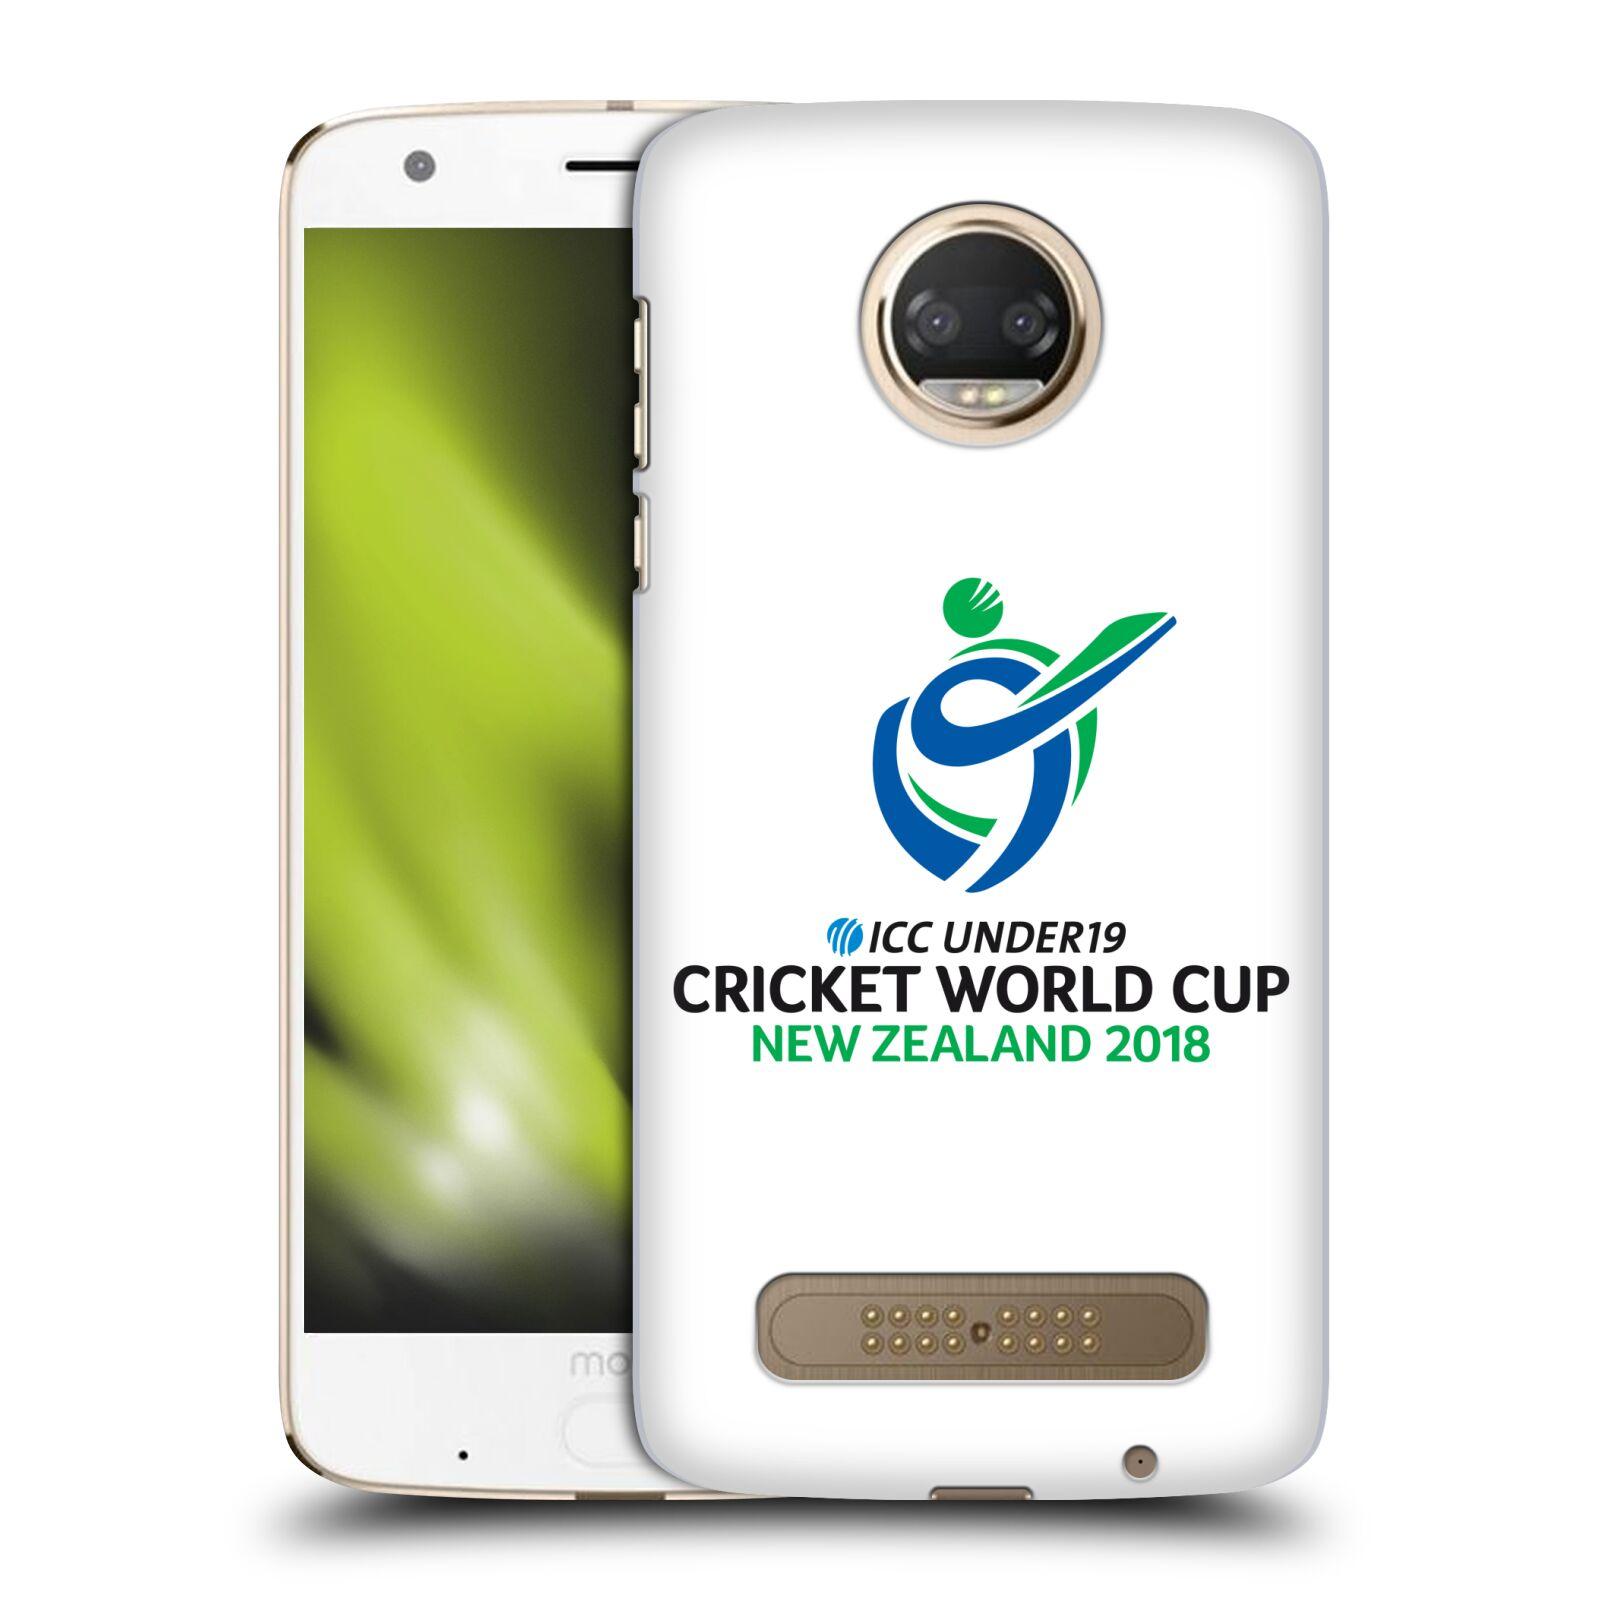 INTERNATIONAL-CRICKET-COUNCIL-UNDER19-WORLD-CUP-2018-CASE-FOR-MOTOROLA-PHONES-1